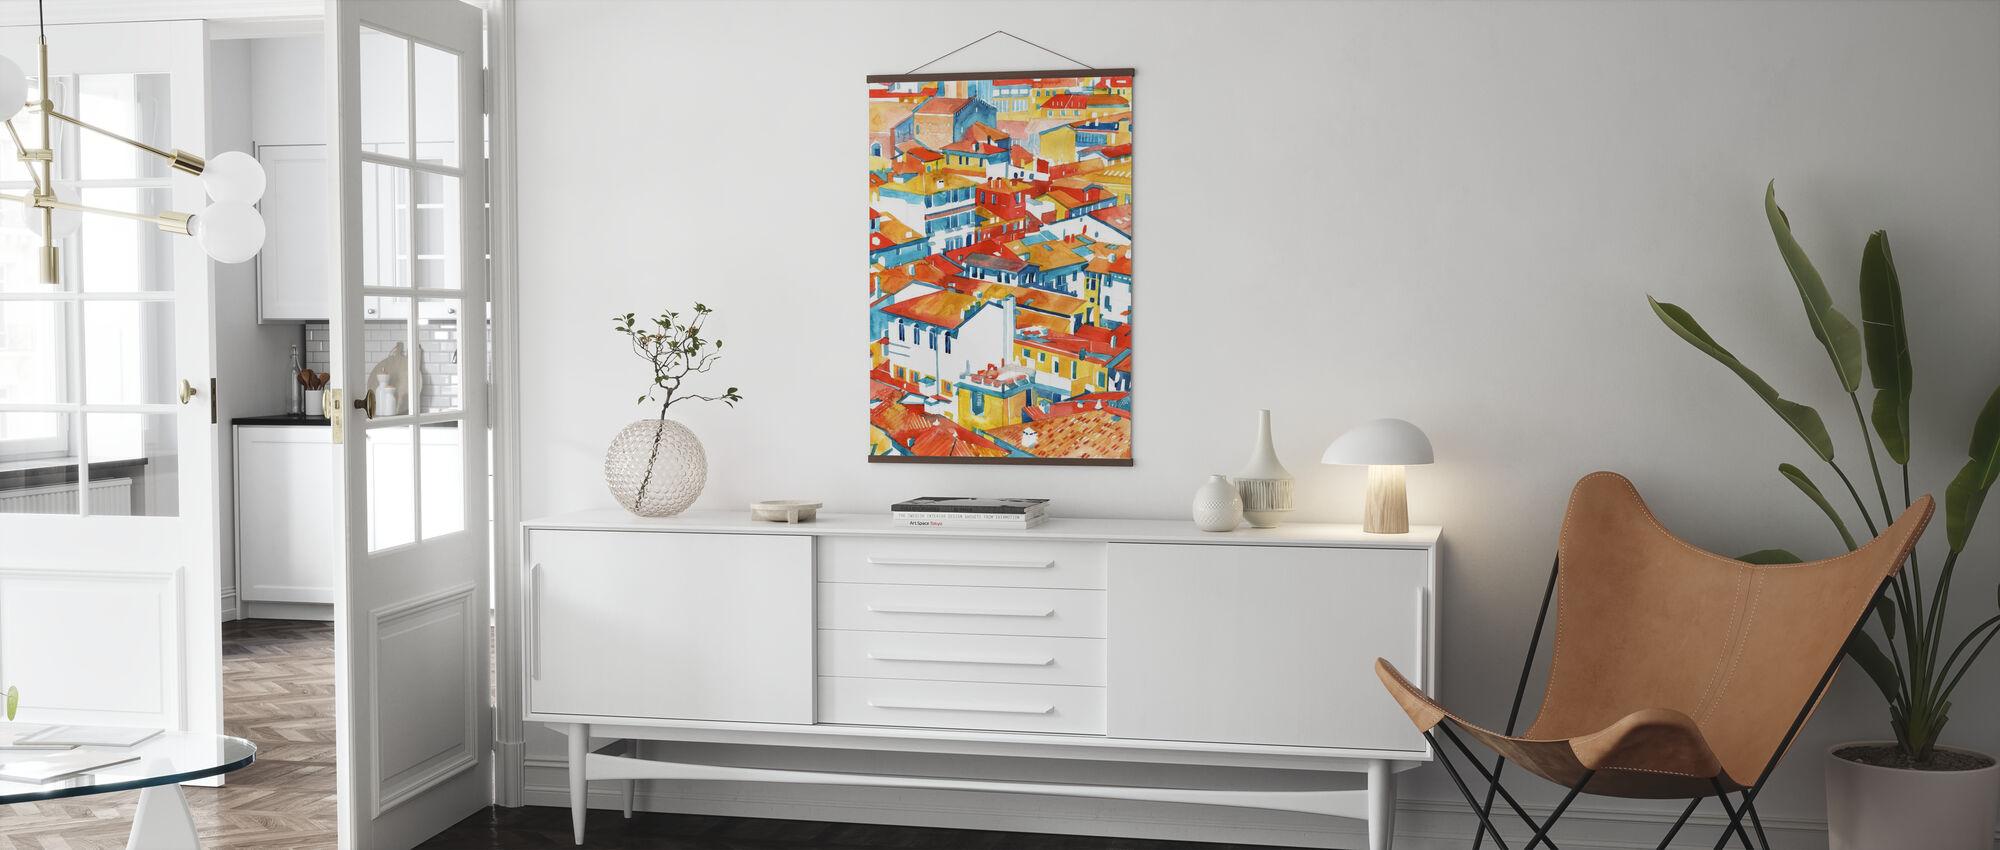 Verona Gebouwen - Poster - Woonkamer